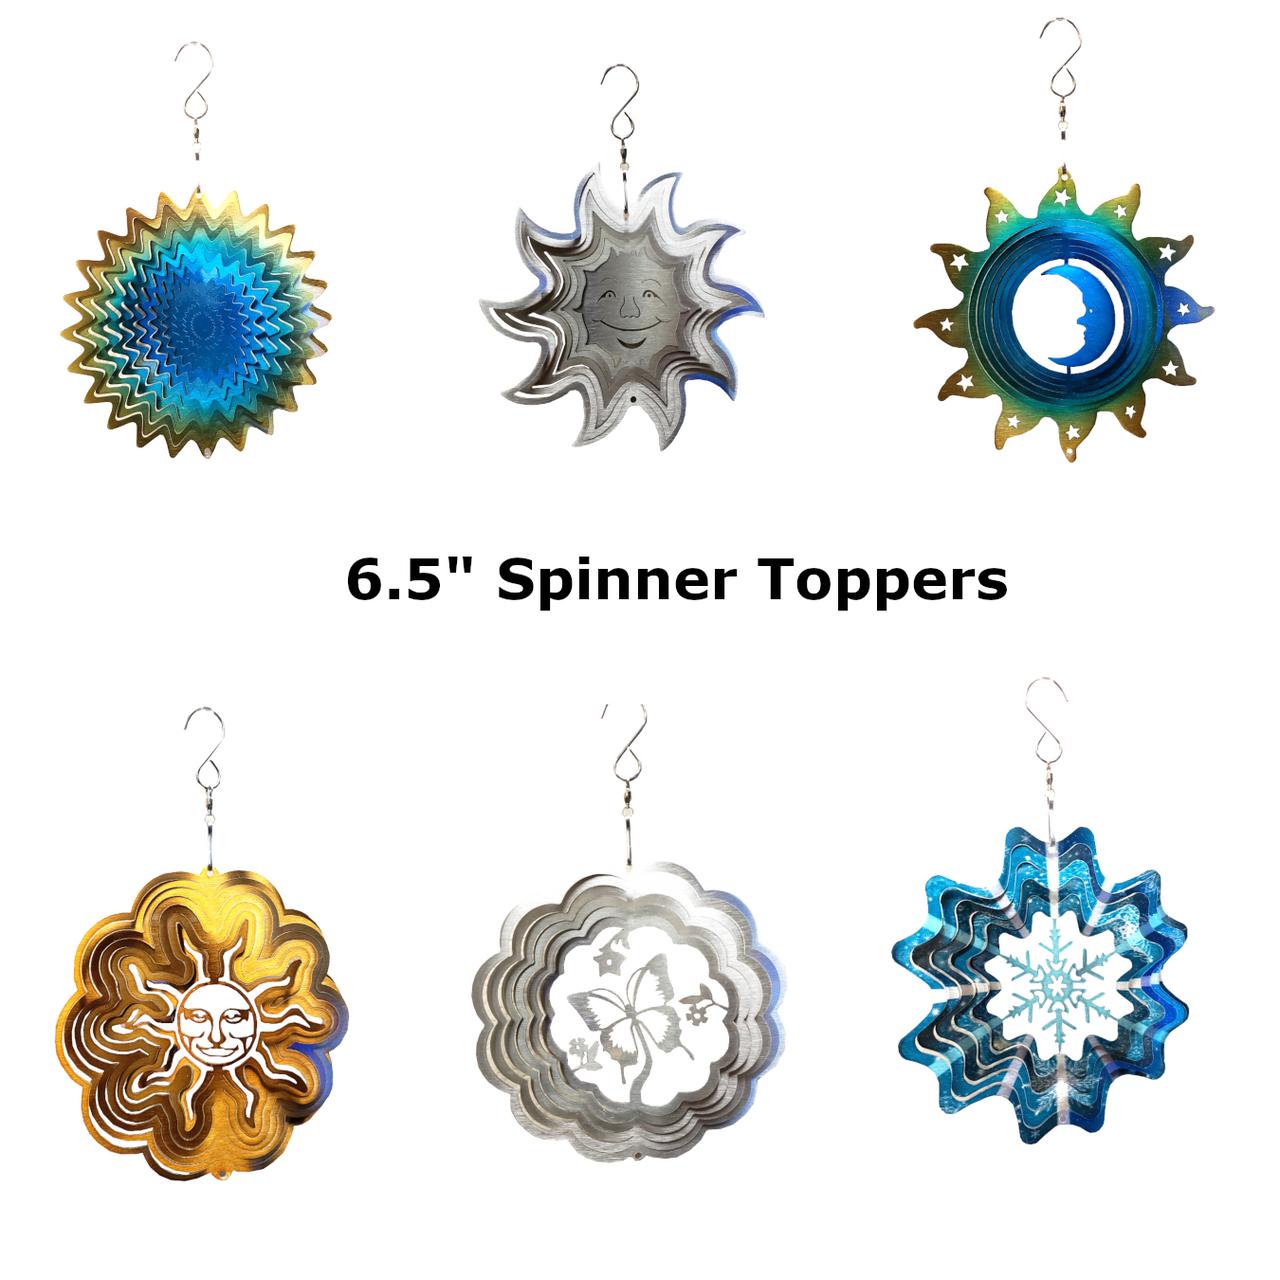 "6.5"" Spinner Topper Piece"